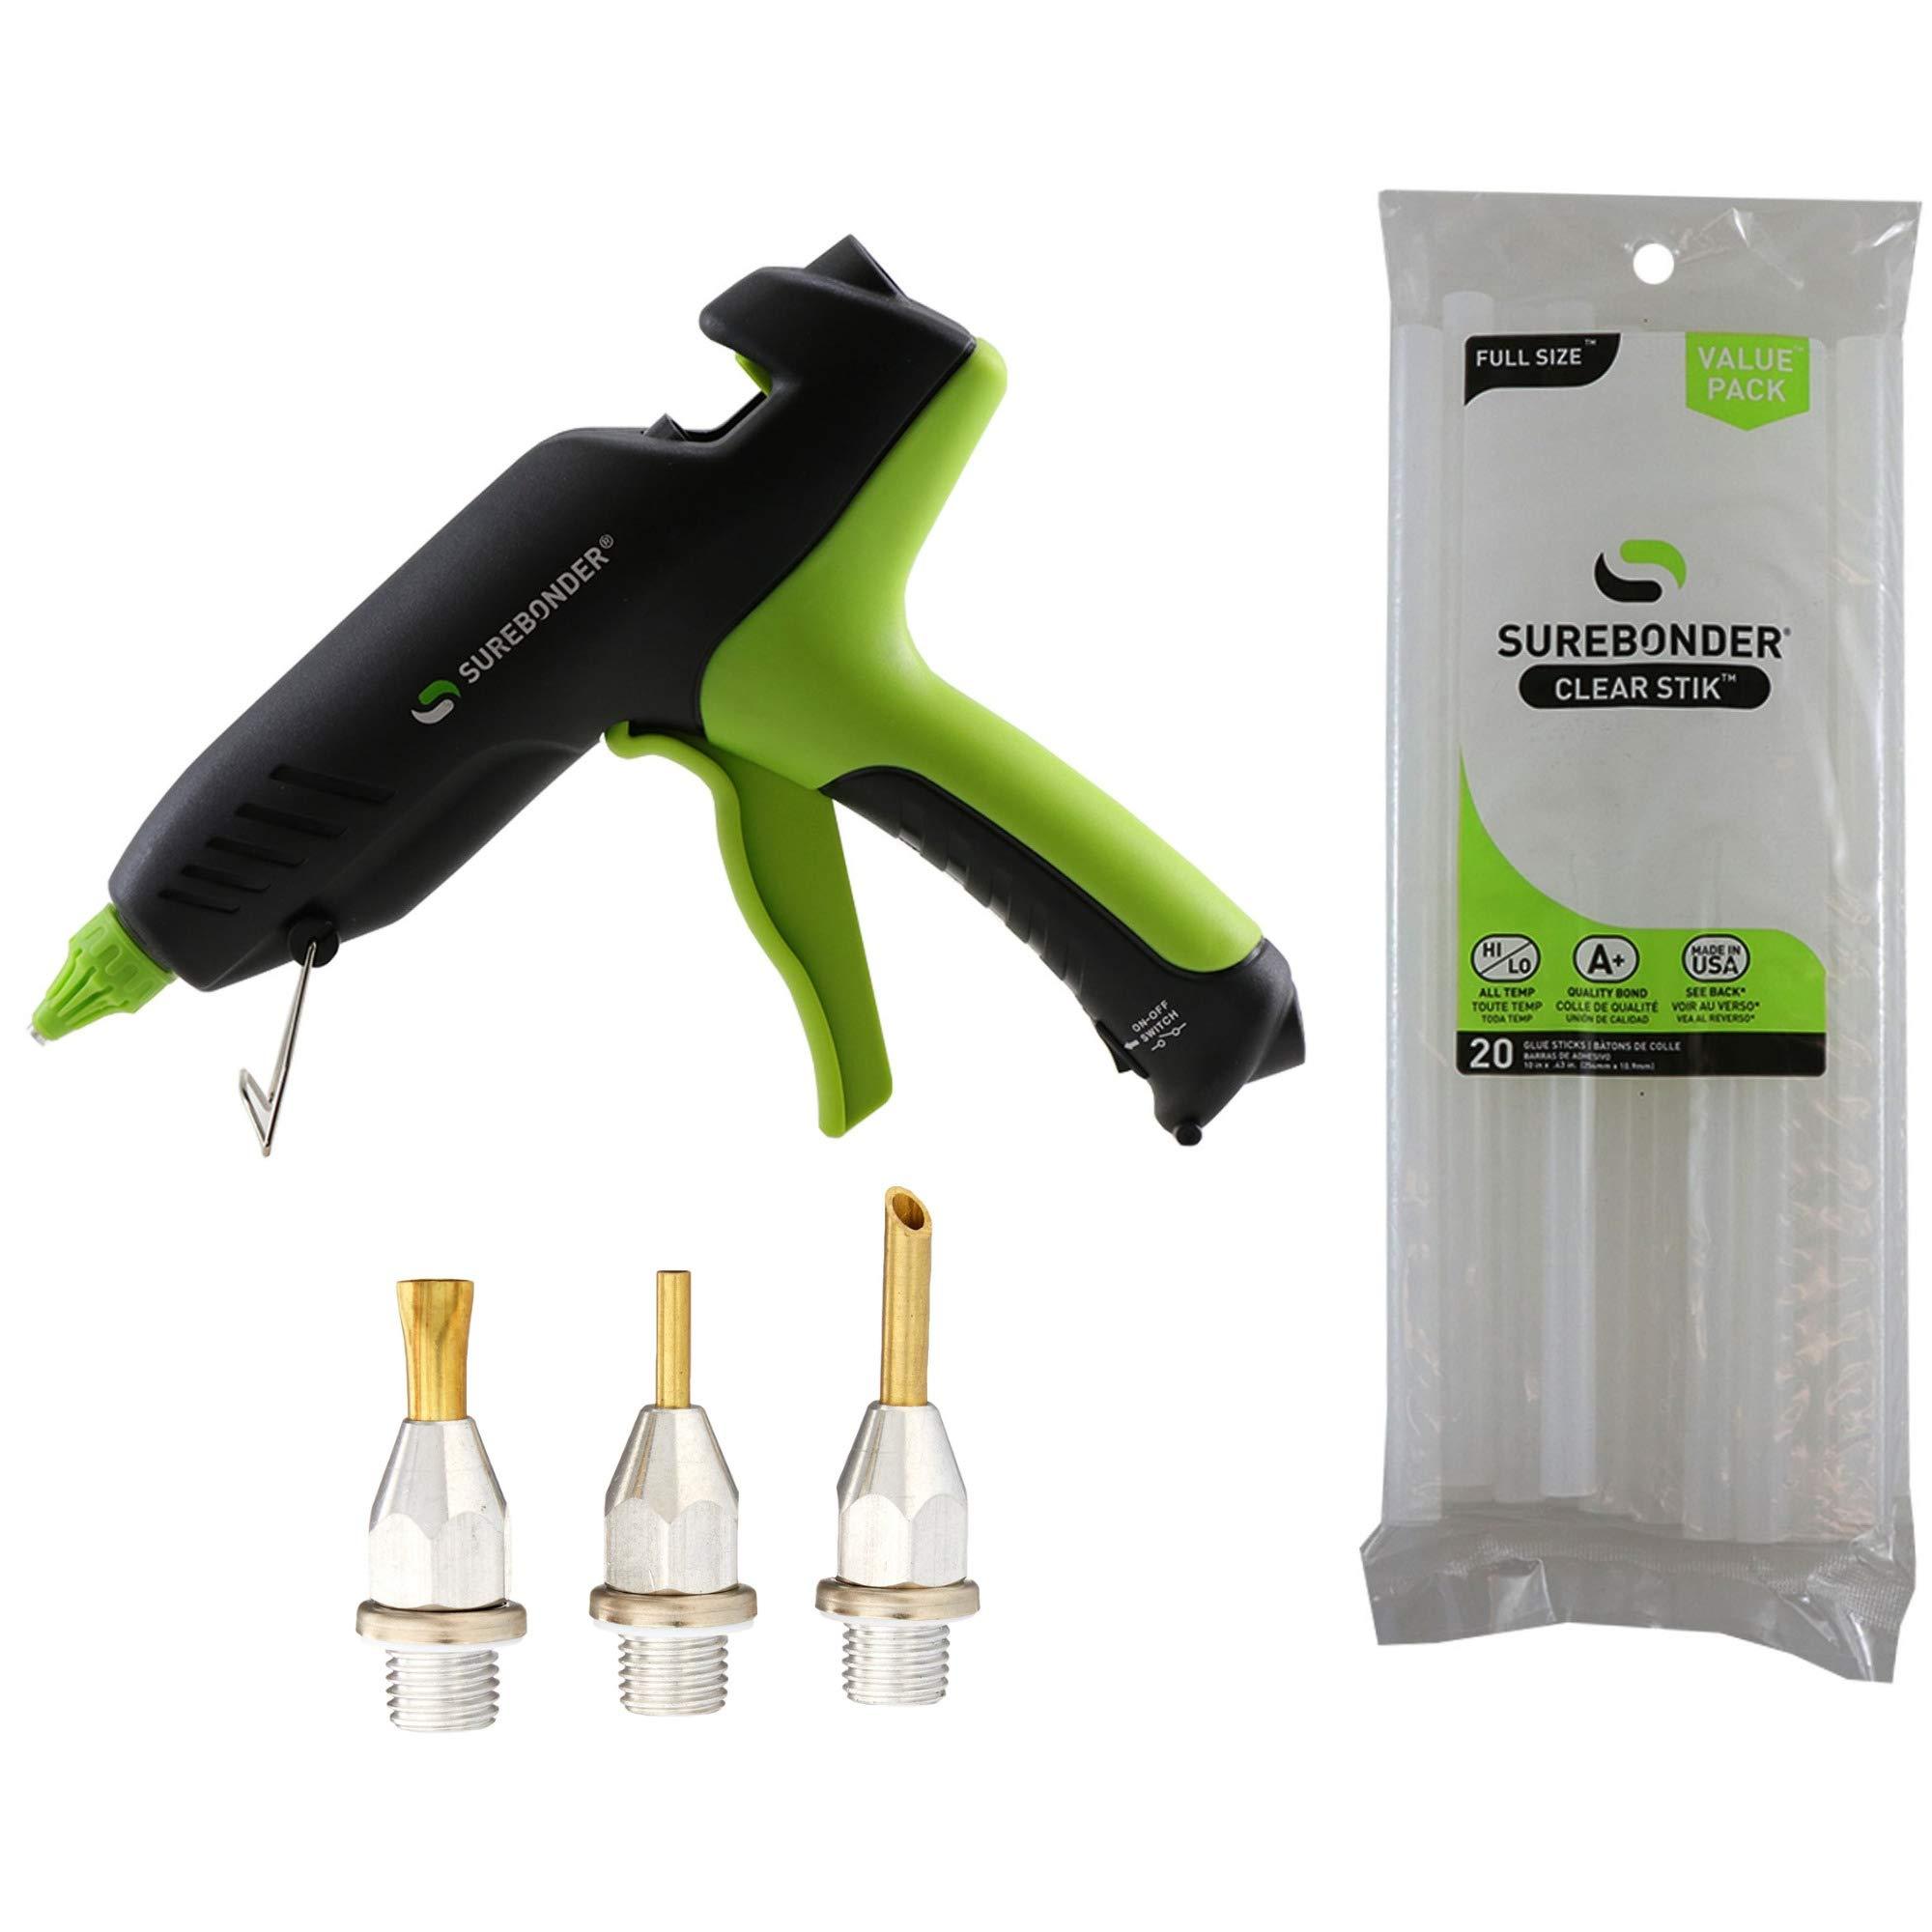 Surebonder 100-Watt High Temperature Professional Heavy Duty Hot Glue Gun + Surebonder 6000 Glue Gun Nozzle Assortment Set (3-Piece) + Surebonder Dual Temperature Hot Glue Sticks (20 Pack) Bundle